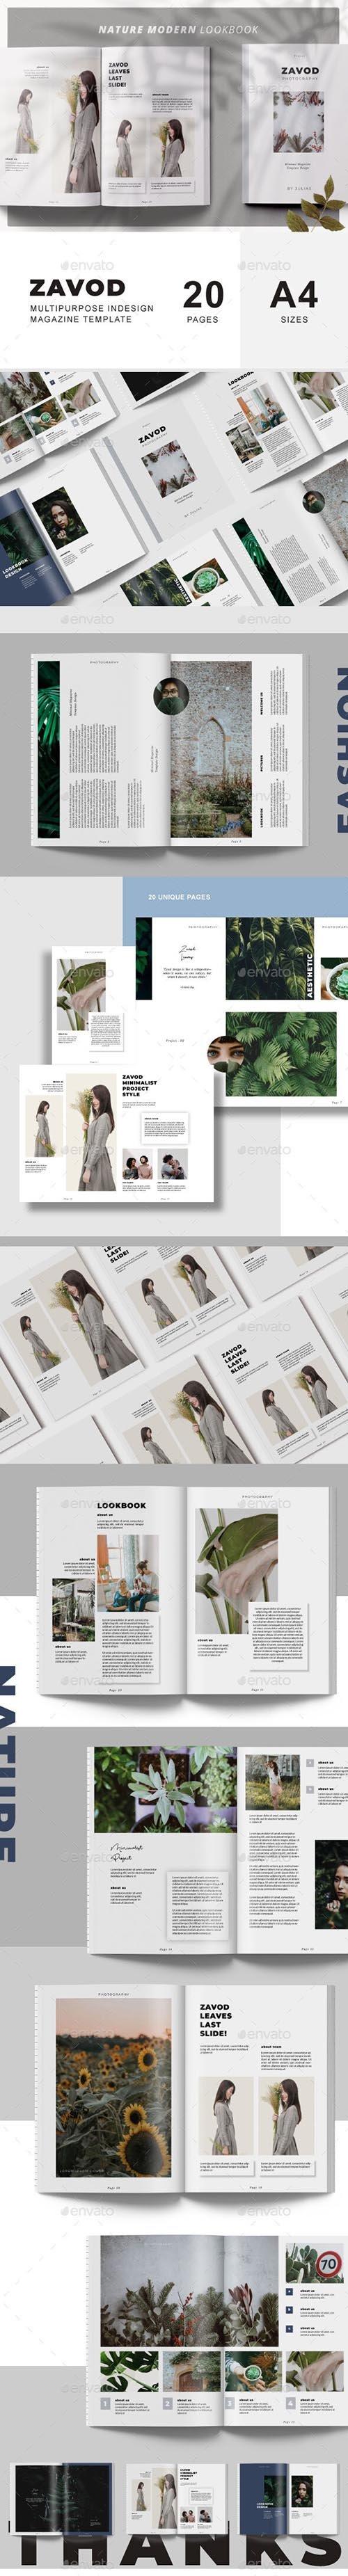 Zavod Lookbook & Catalog Template 23797632